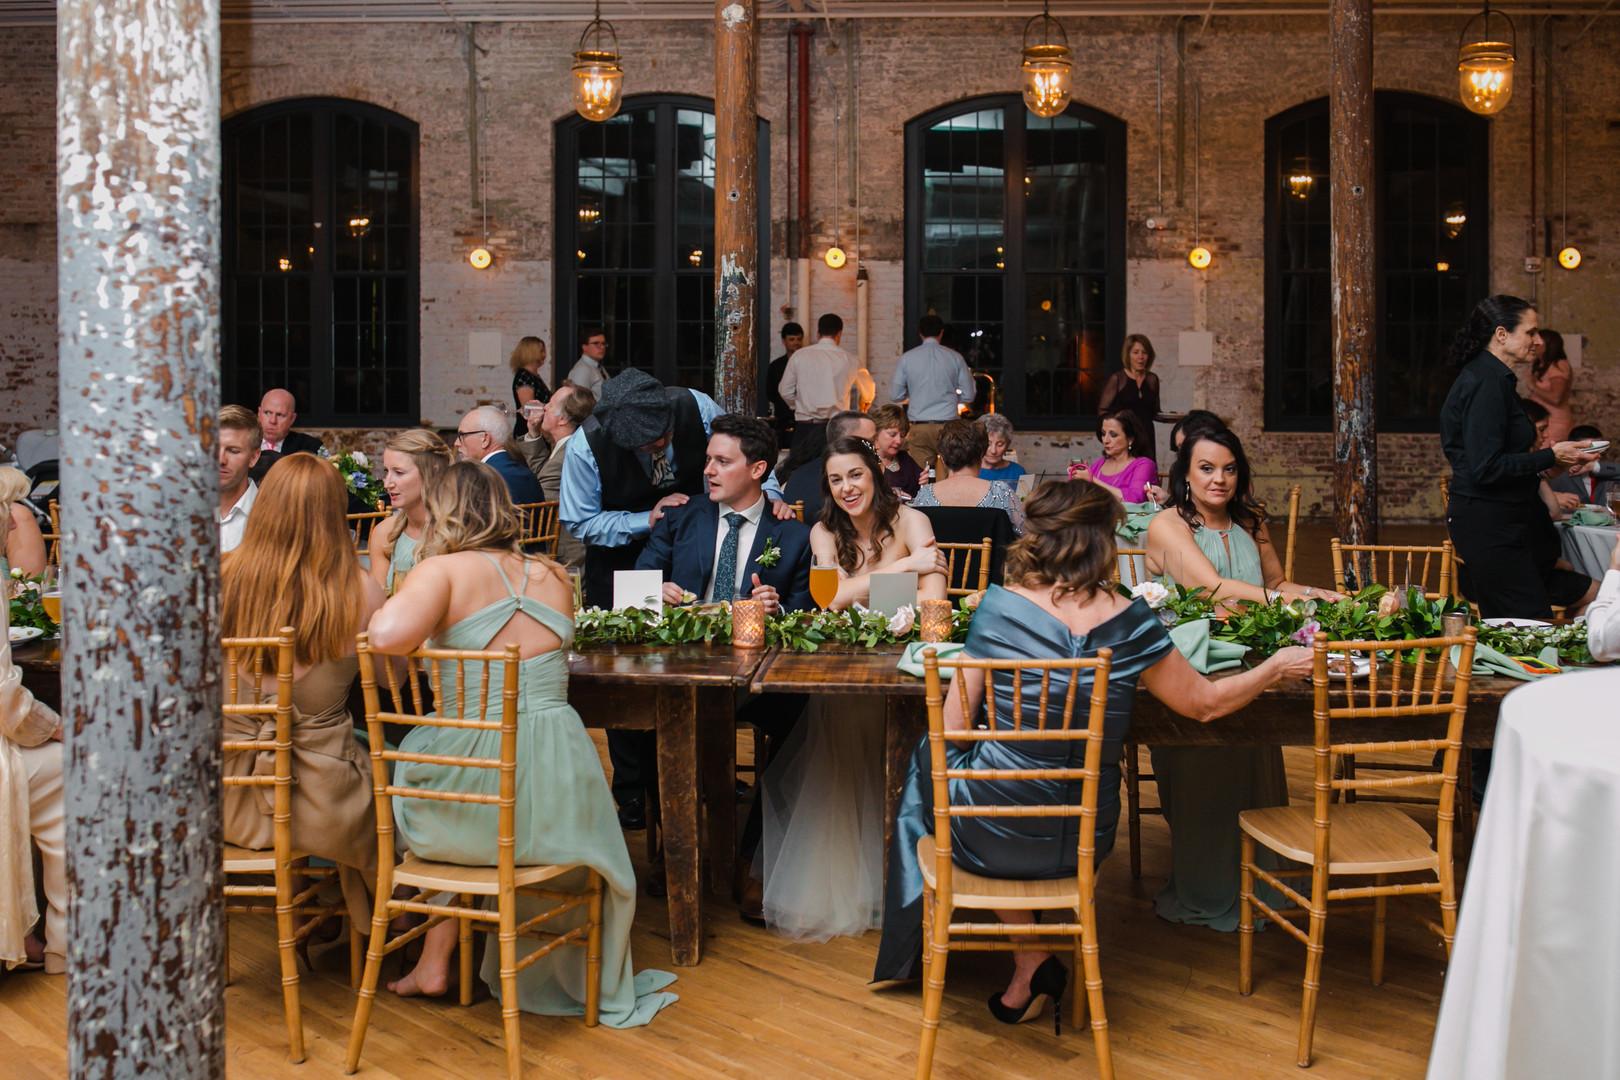 cedar-room-wedding-33.jpg